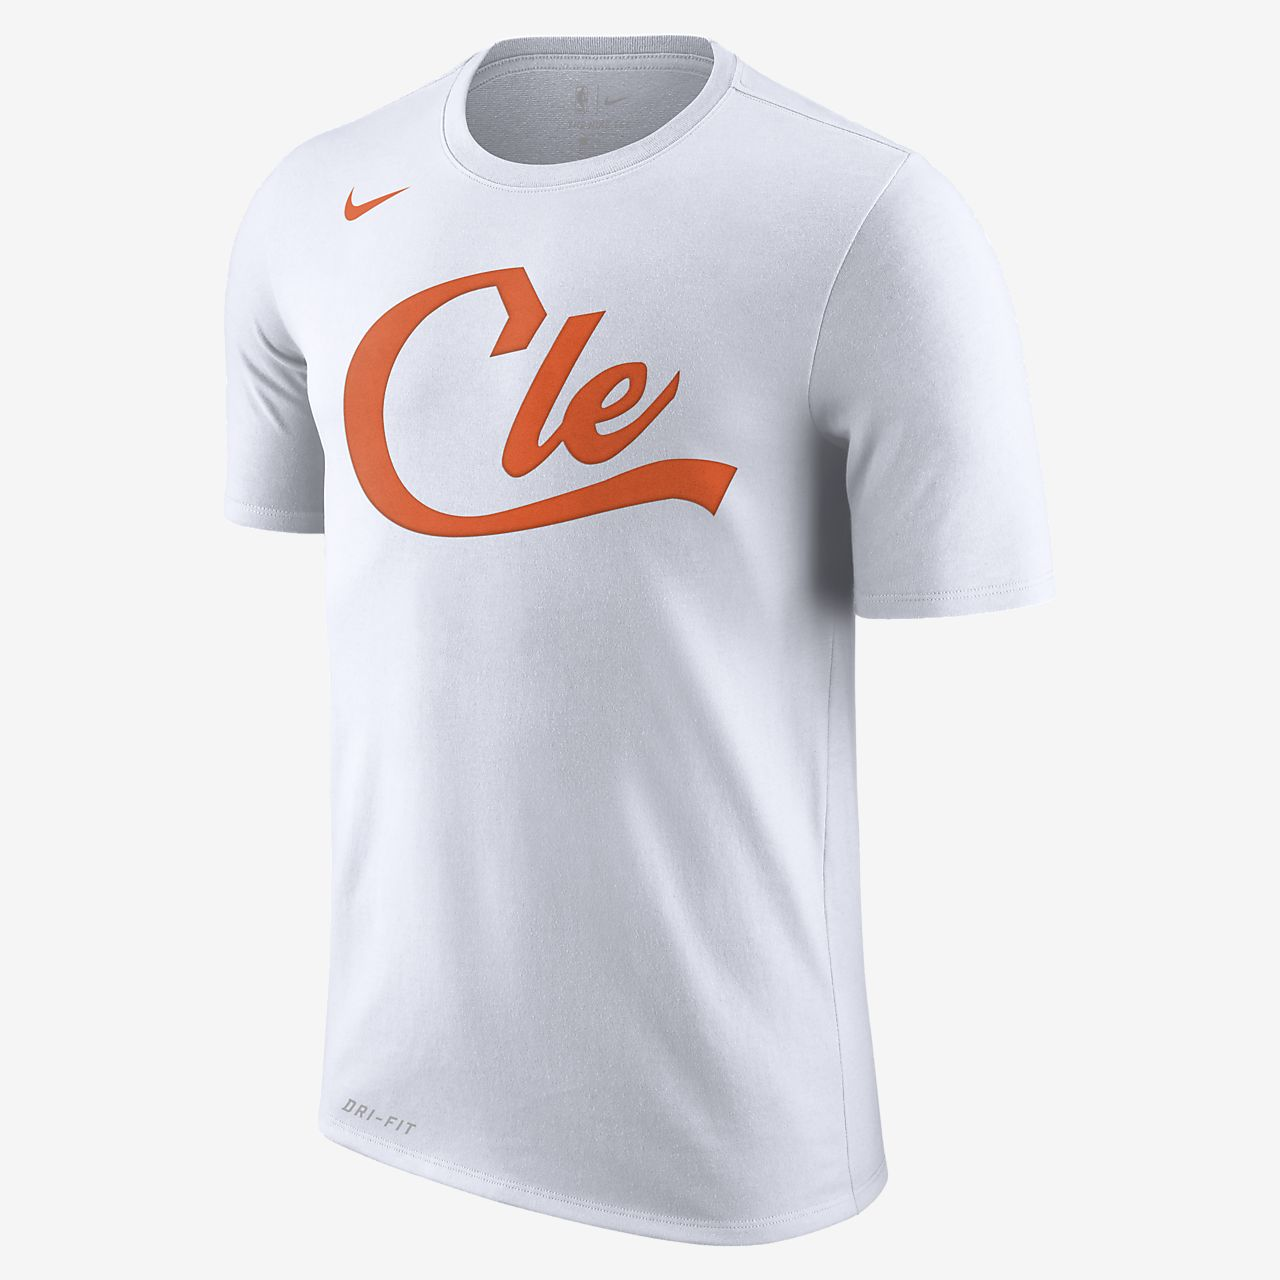 567b3018de6 Cleveland Cavaliers City Edition Nike Dri-FIT Camiseta de la NBA - Hombre